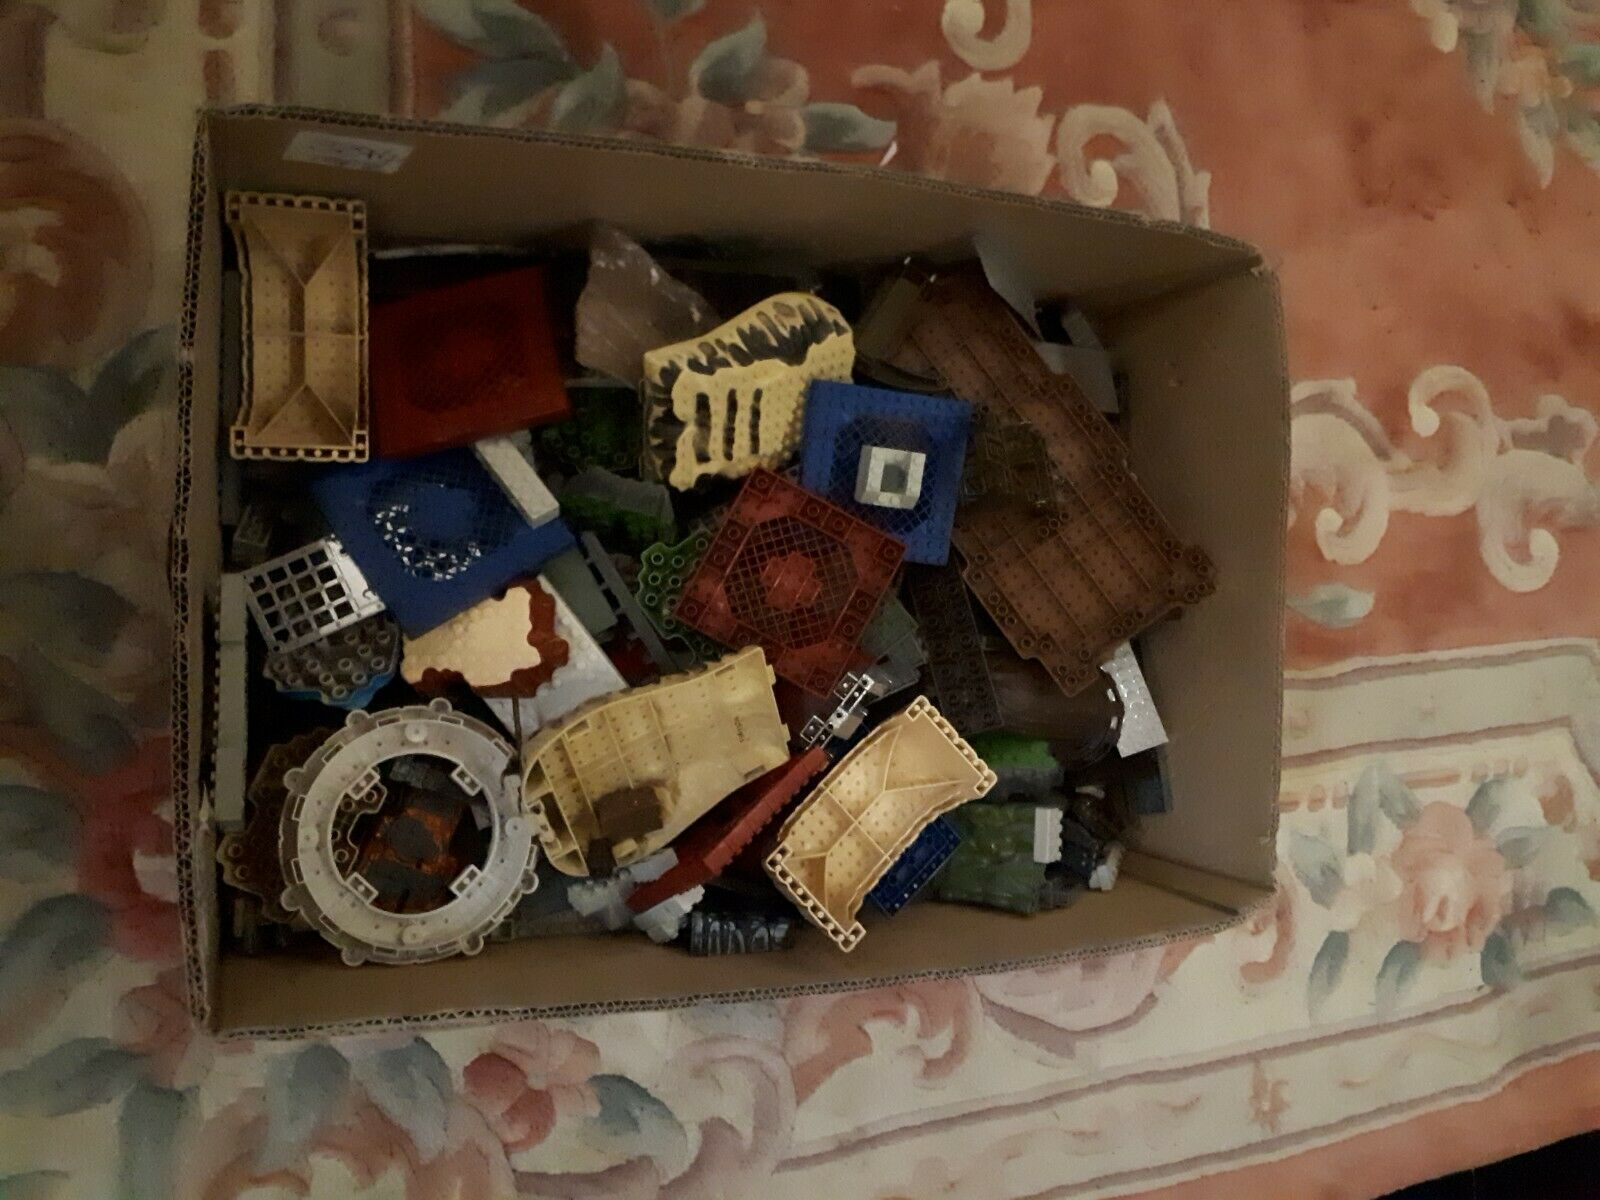 Joblot of LEGO Type Mega Bloks Bloks Bloks 2 Open Boxes Full Dragon Castle Etc e19b56